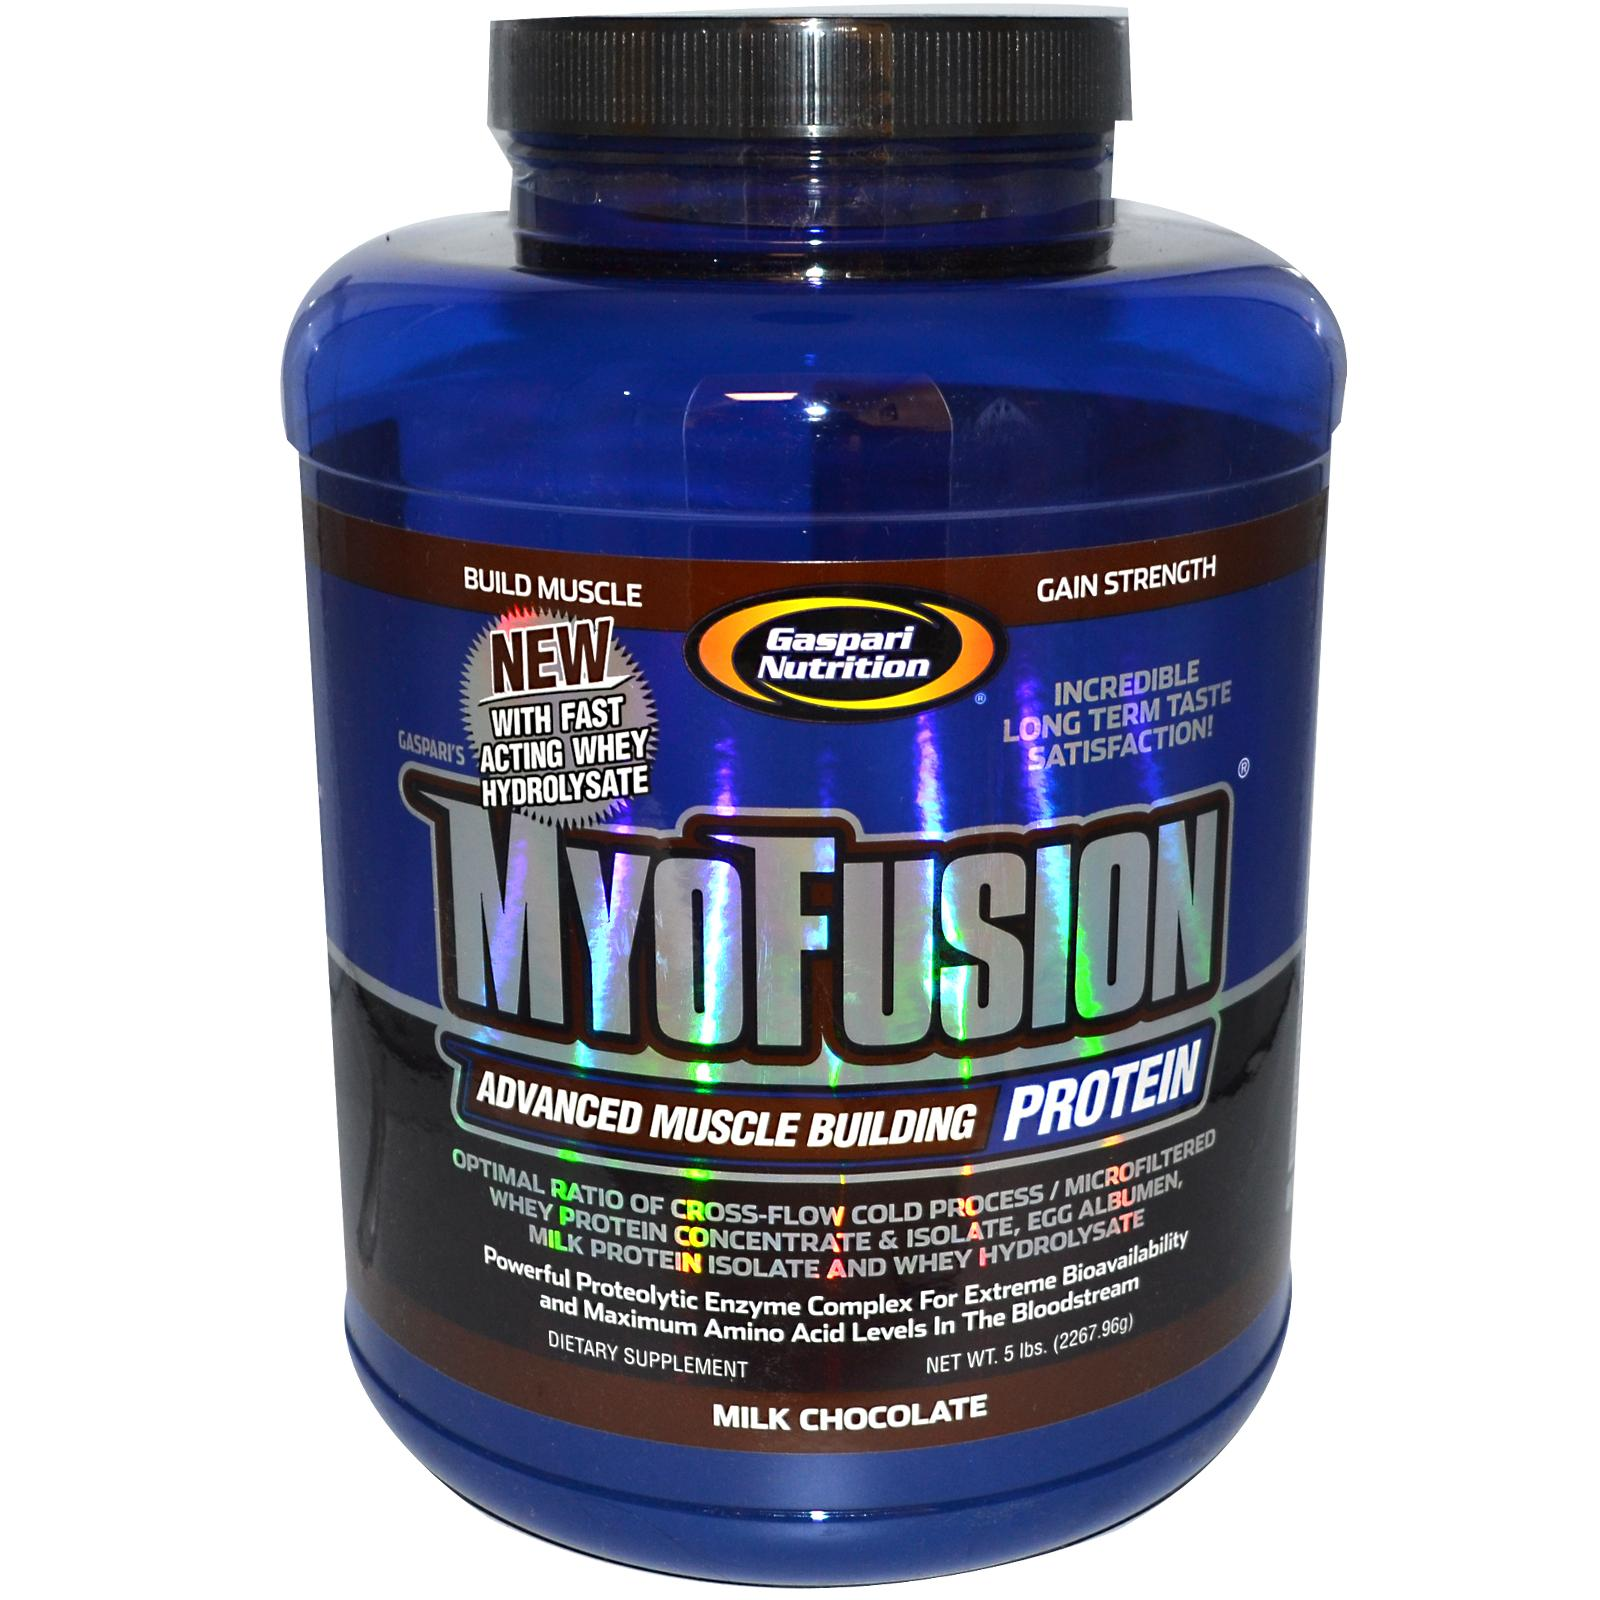 AvP Supplement Bodybuilding Supplement Store Myofusion 5lbs